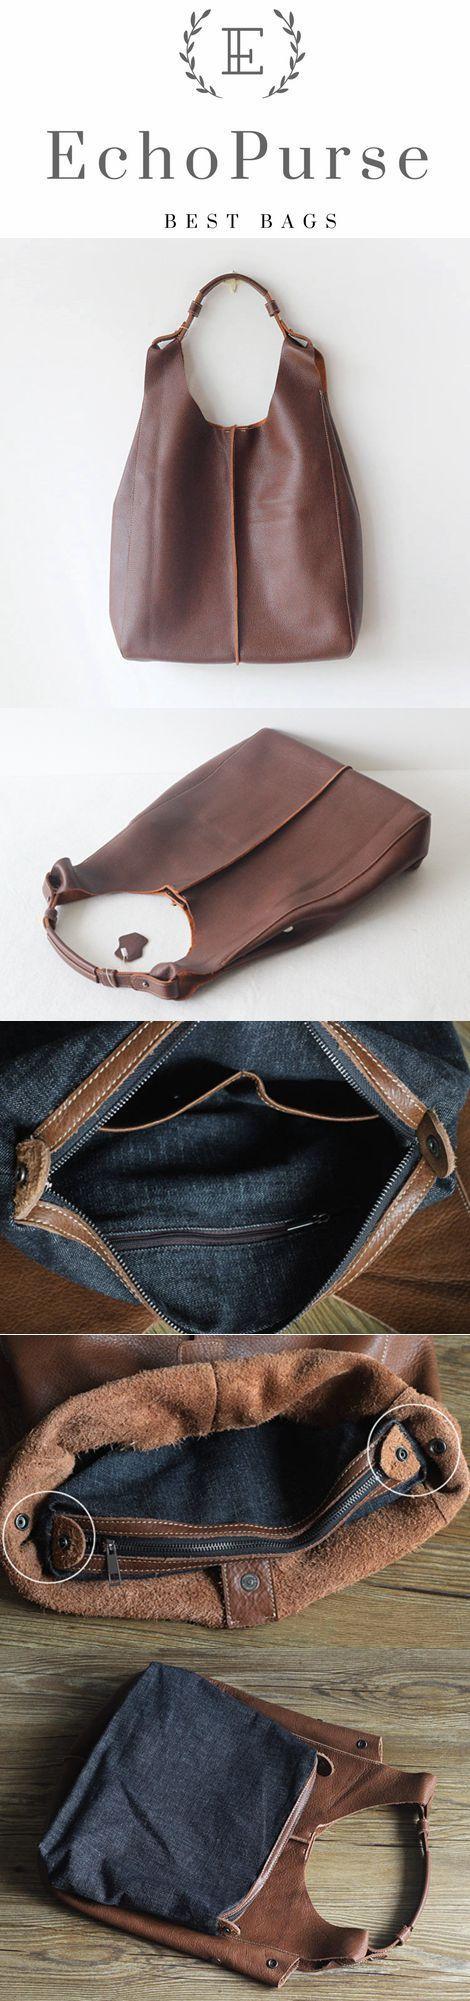 Handmade Vintage Full Grain Leather Tote Bag Shoulder Bag Handbag PPM102 Handmade Vintage Full Grain Leather Tote Bag Shoulder Bag Handbag PPM102